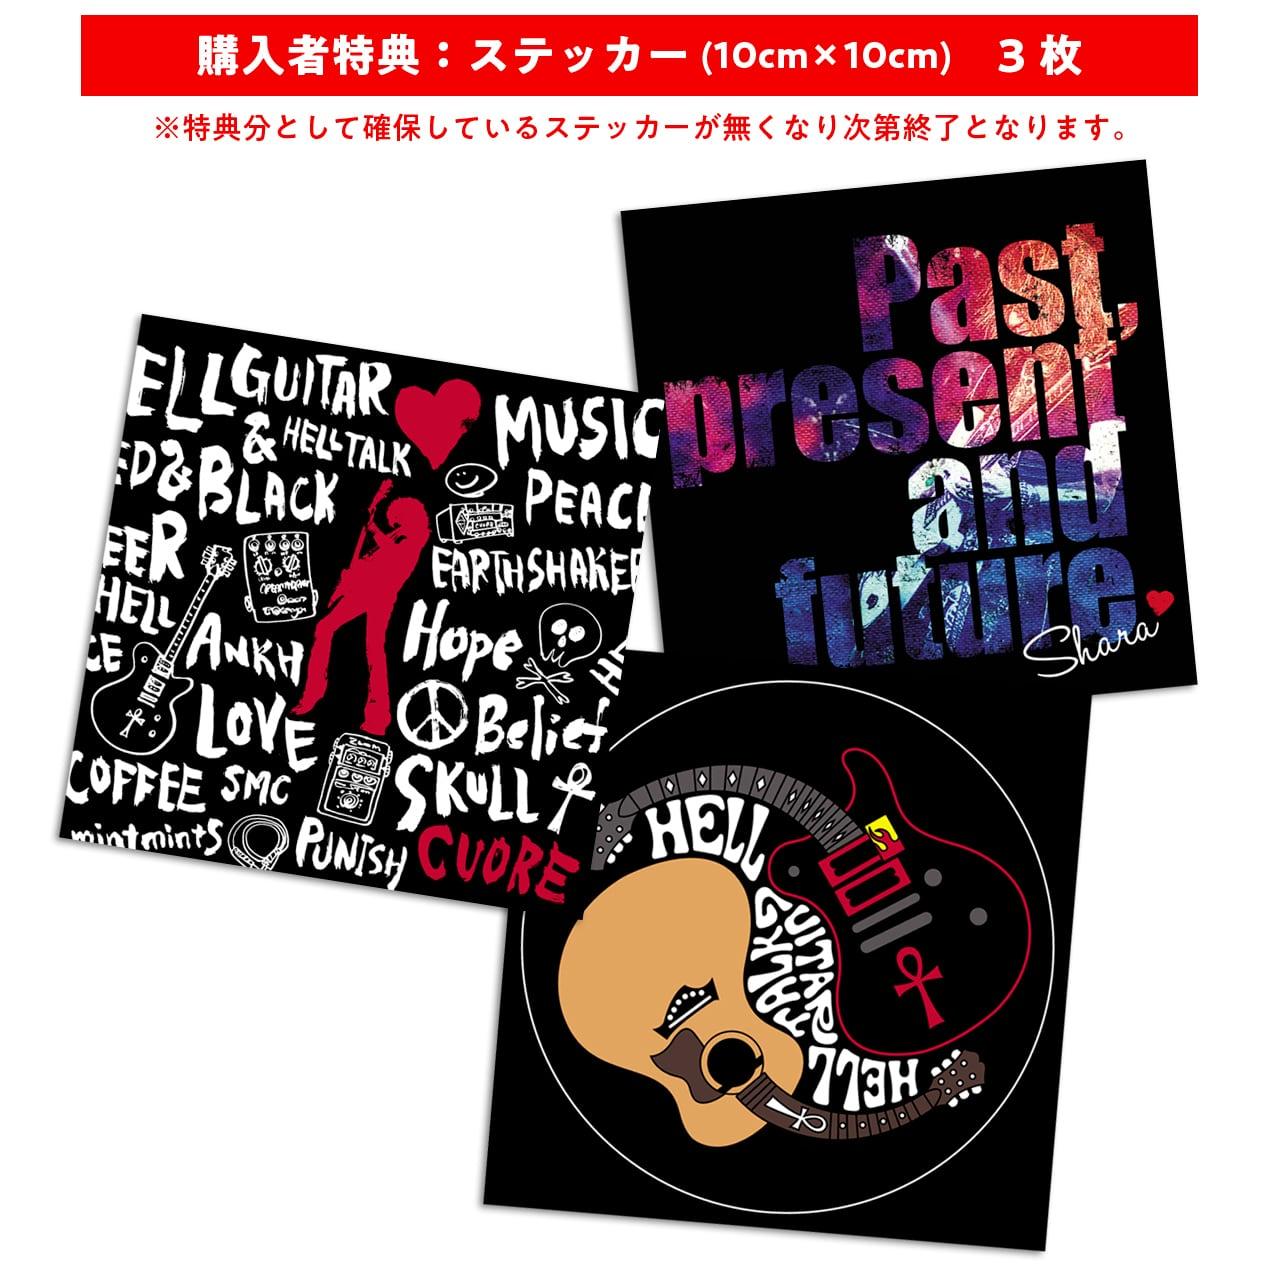 CD:『Past,present and future』SHARA +特典付 - 画像2